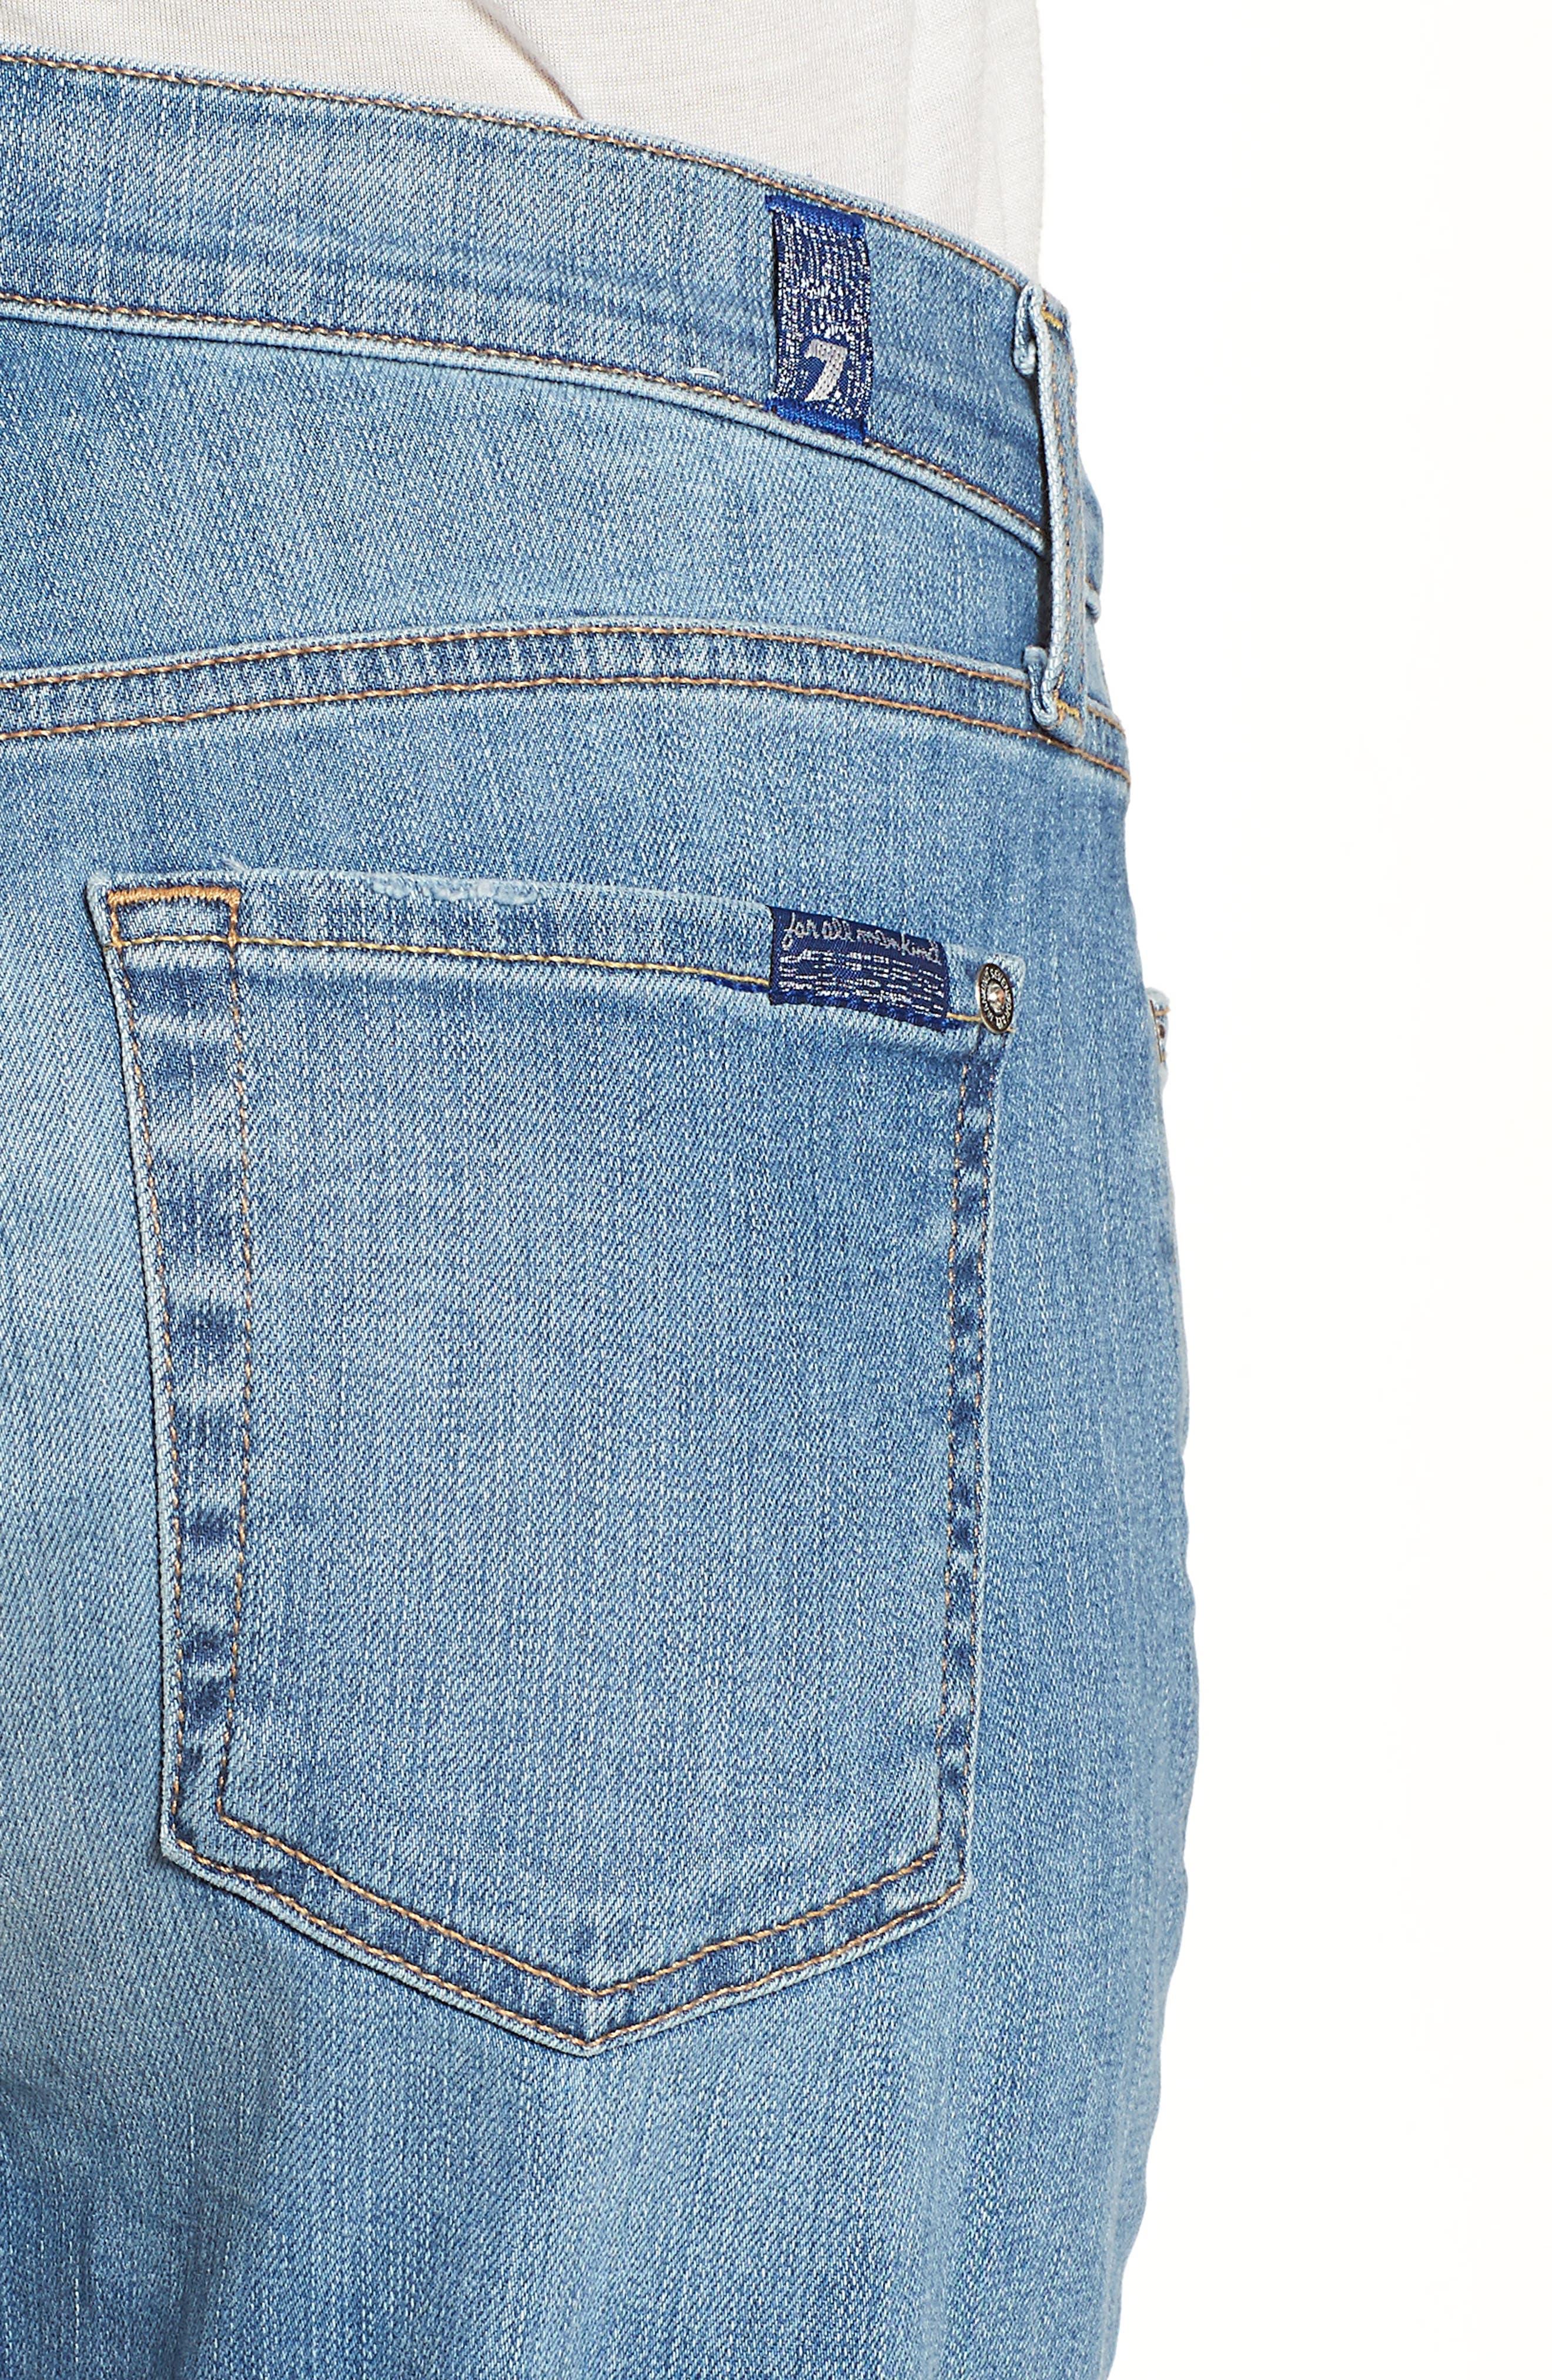 Josefina High Waist Boyfriend Jeans,                             Alternate thumbnail 4, color,